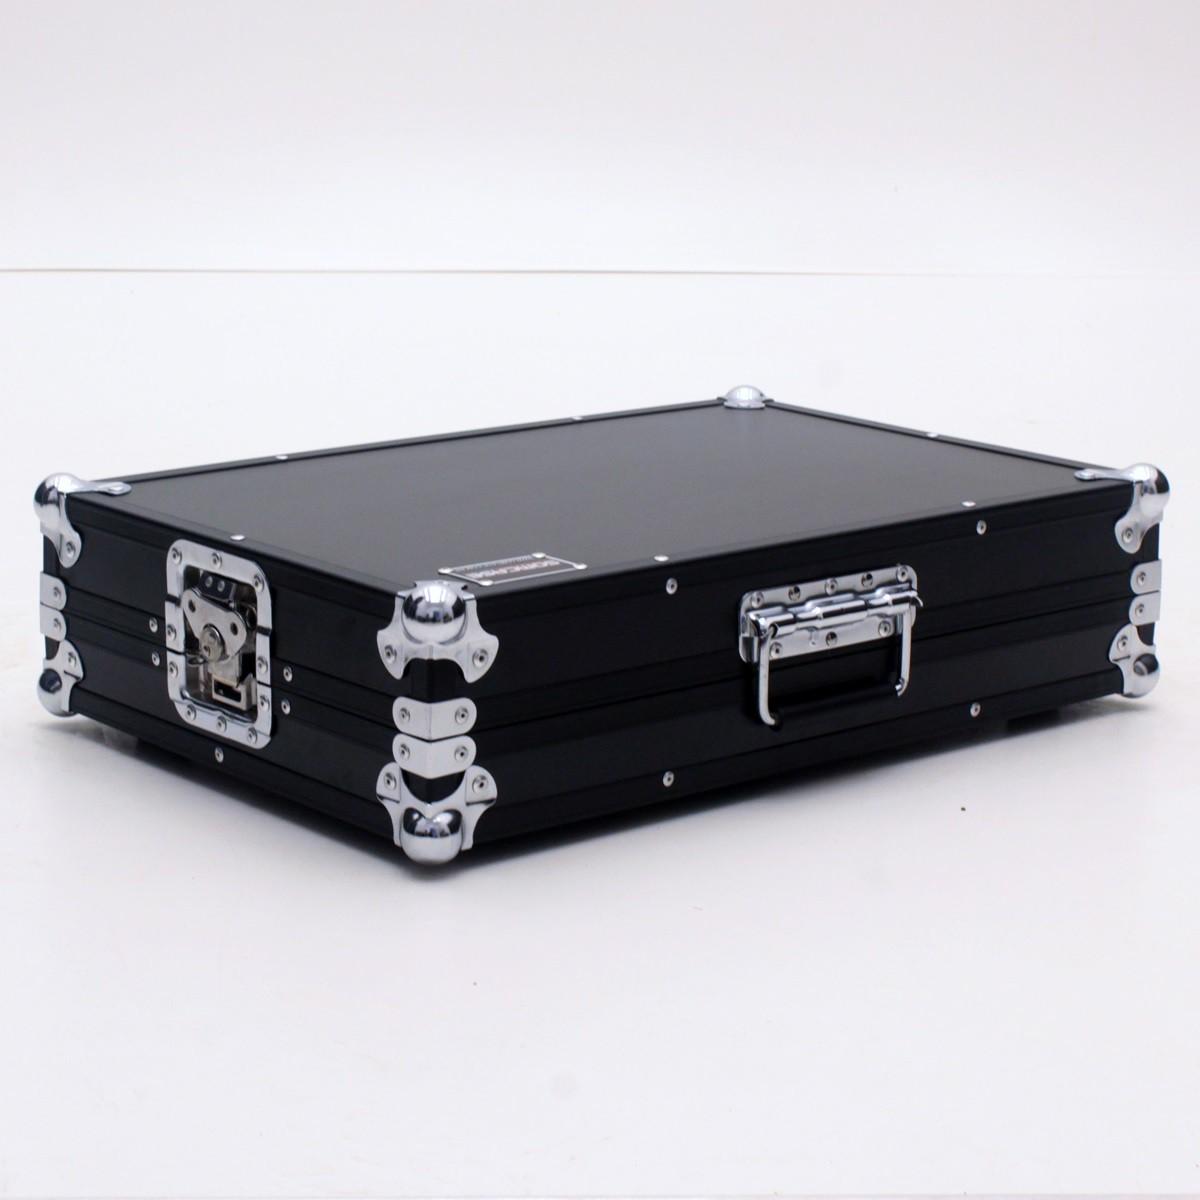 Case SB SB2 com Plataforma Móvel Black *SEMINOVO*